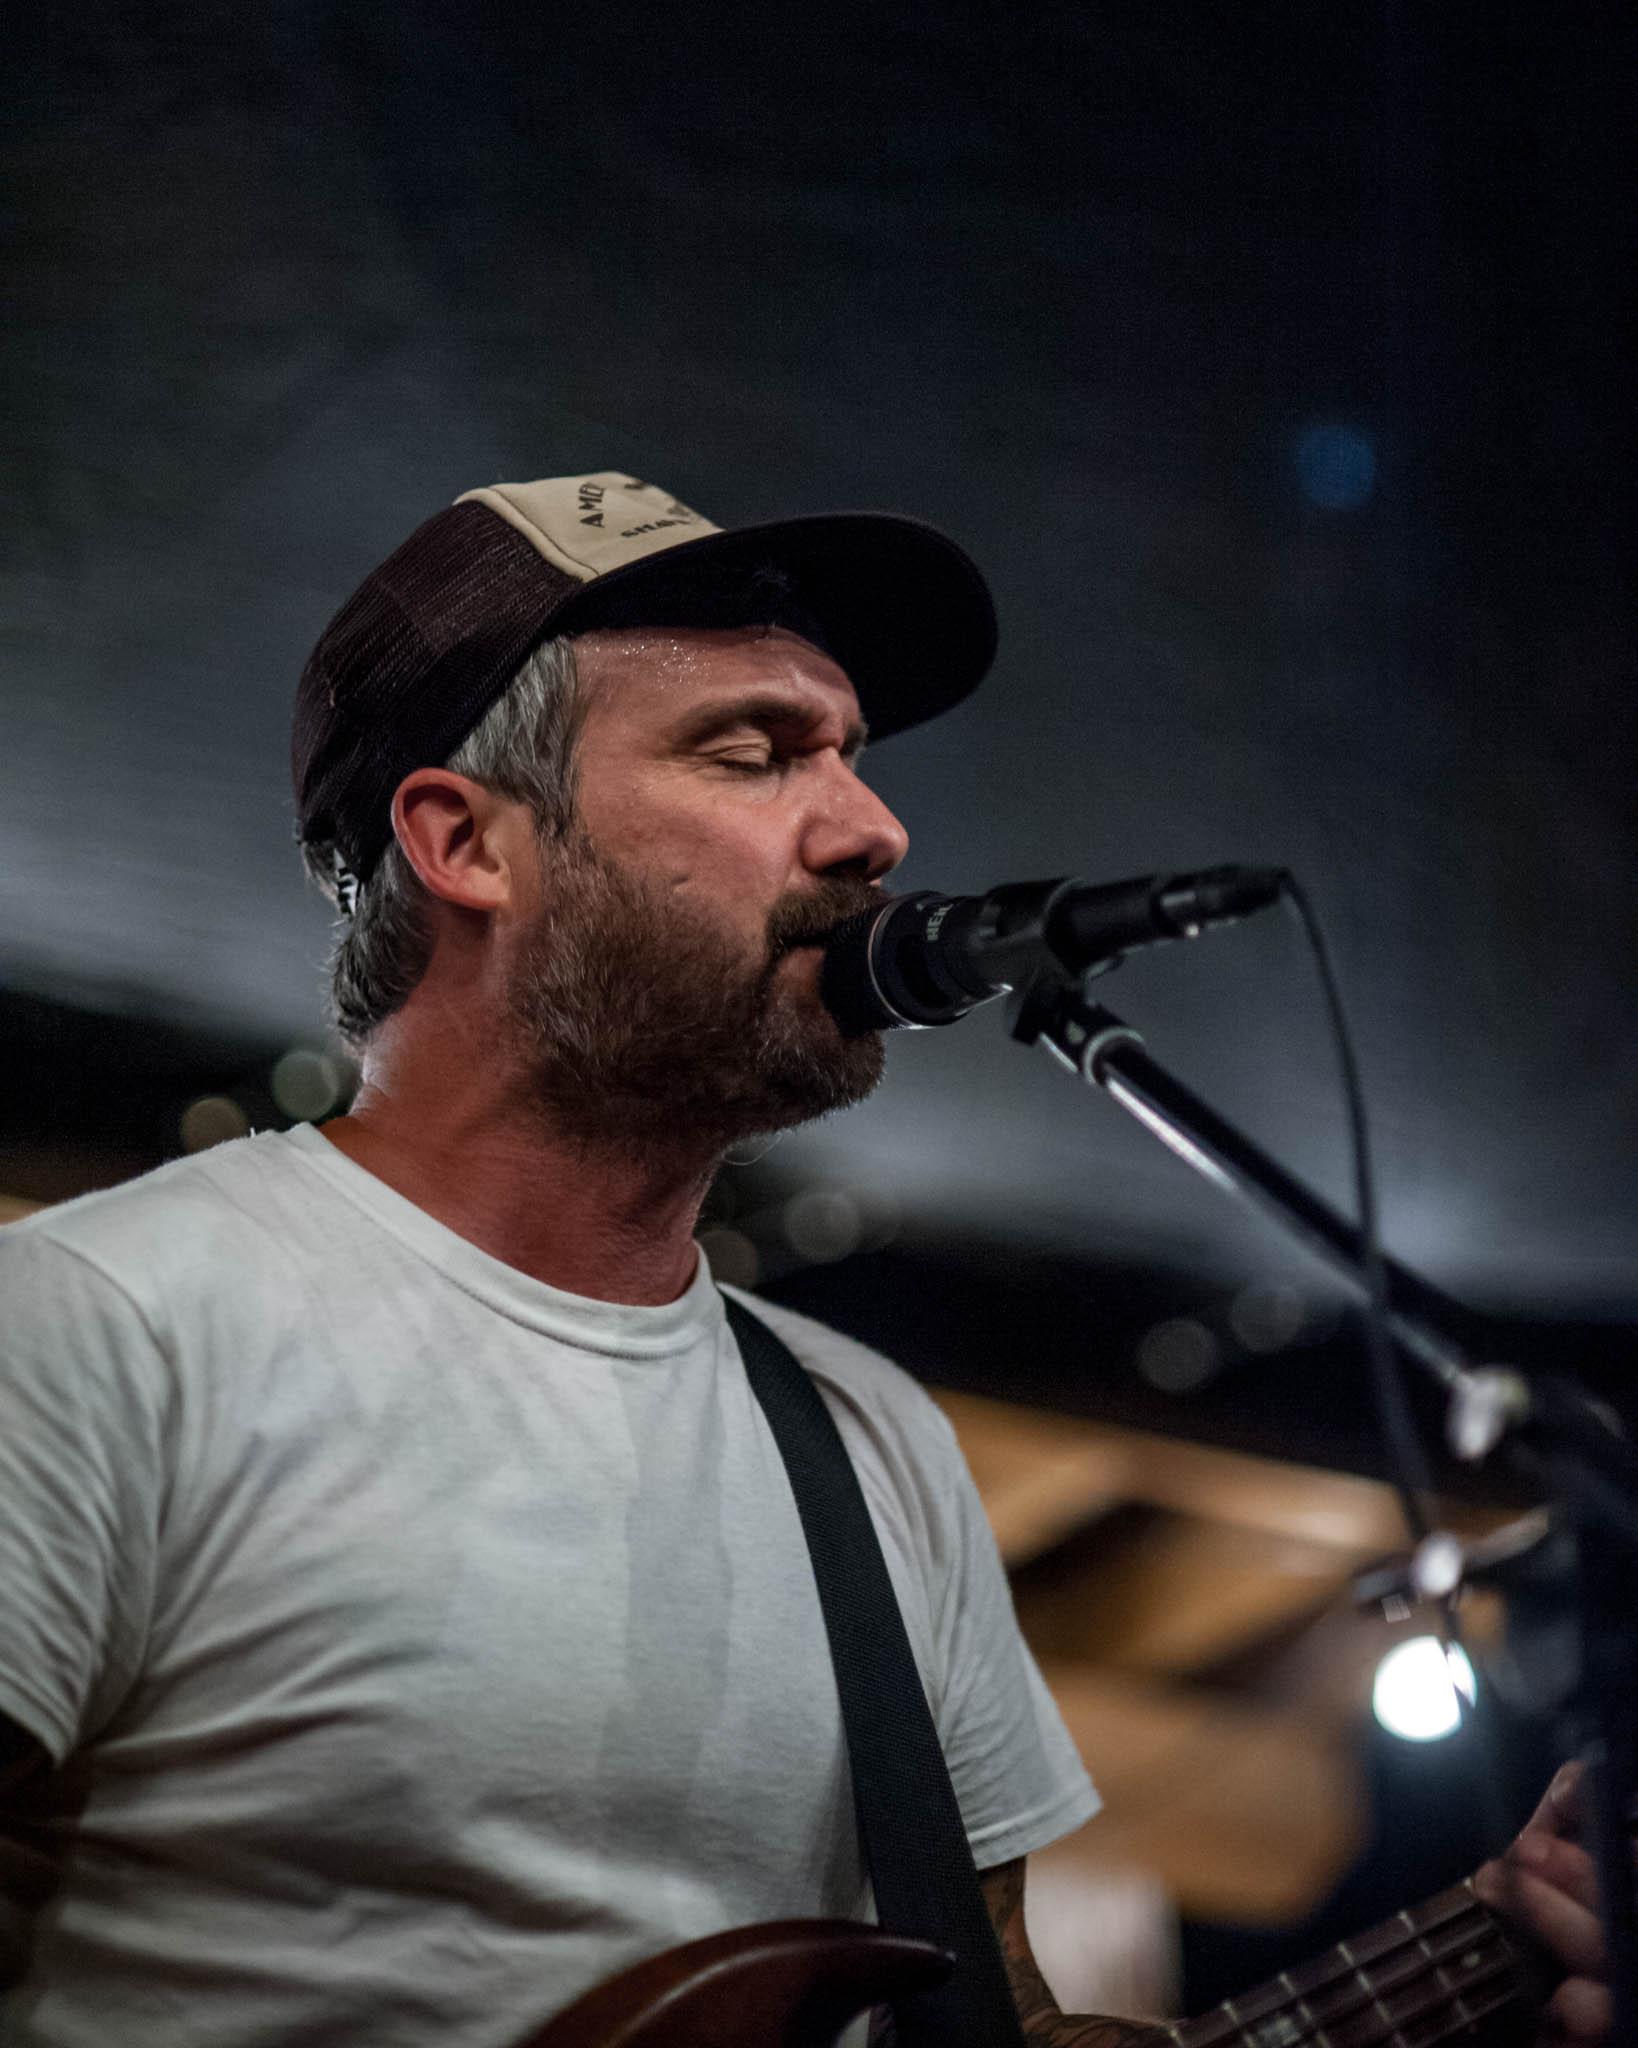 William Elliot Whitmore playing Grey Area 2018 at Flat Black Studios near Iowa City